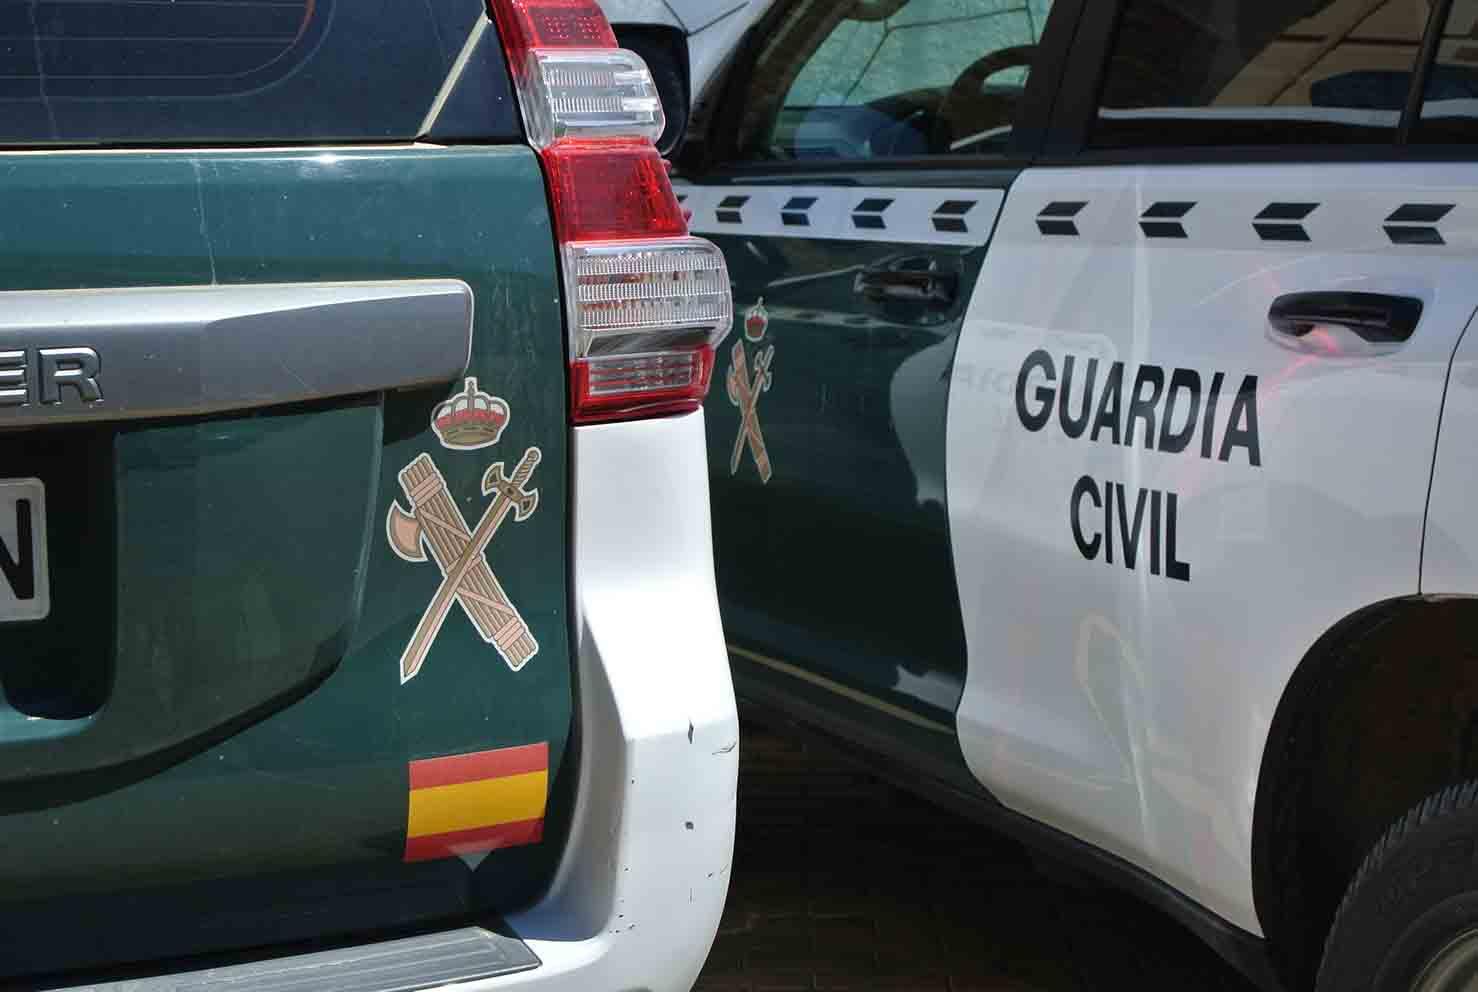 coche, guardia civil, vehículo